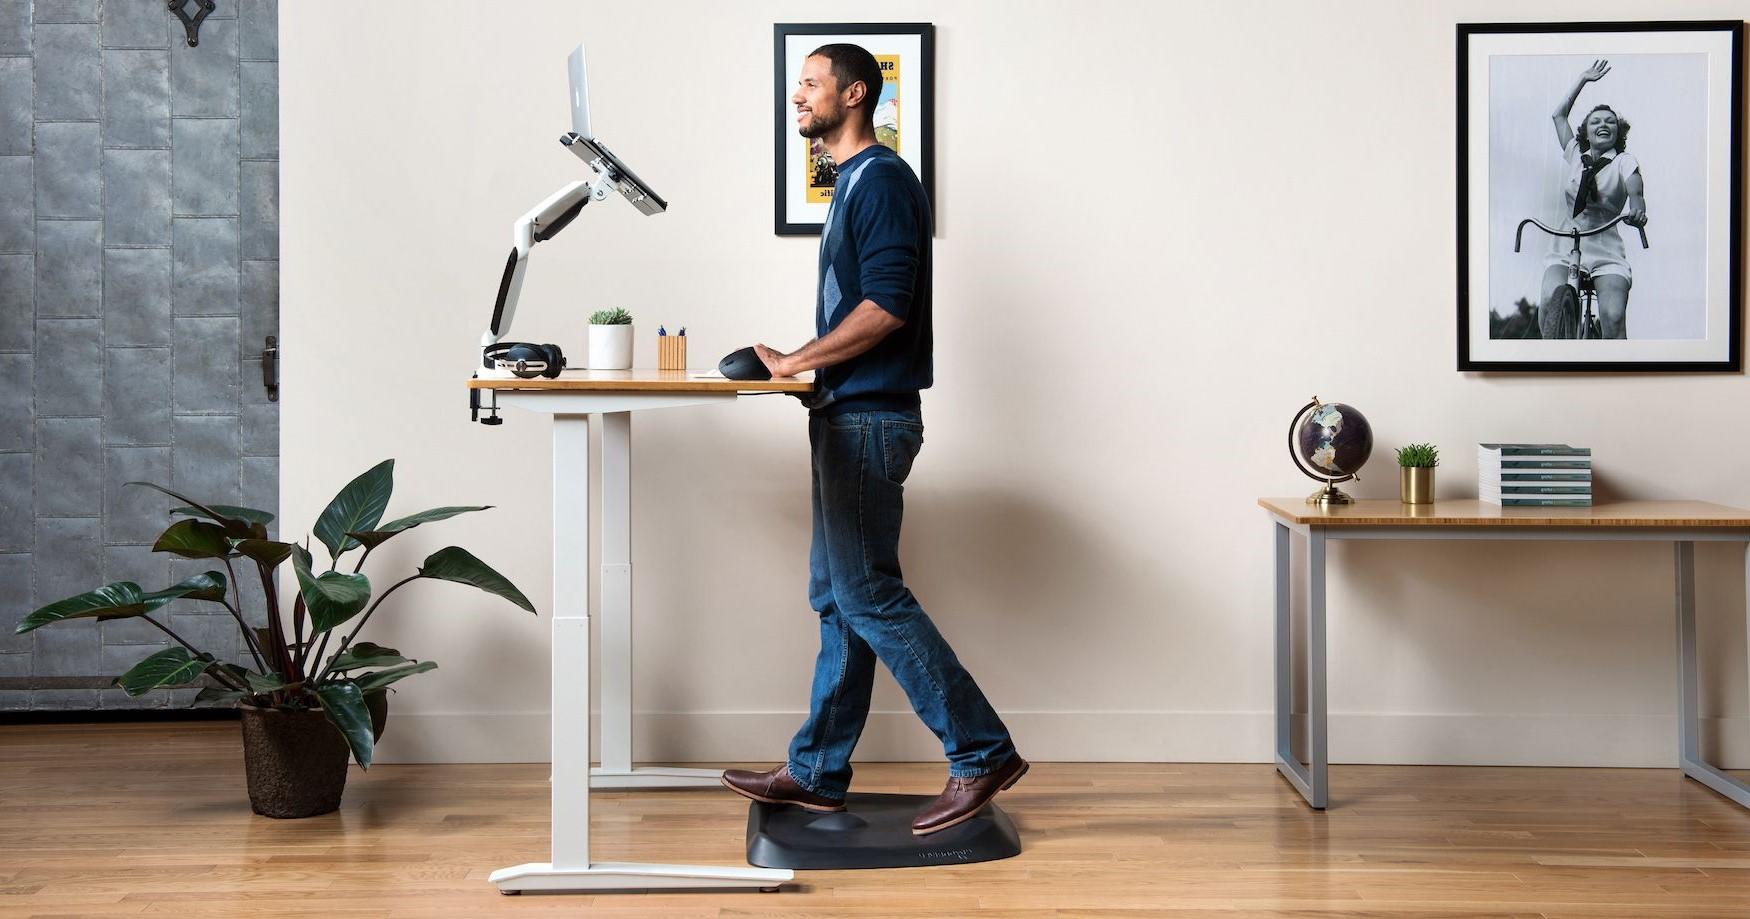 Meilleur tapis standing desk